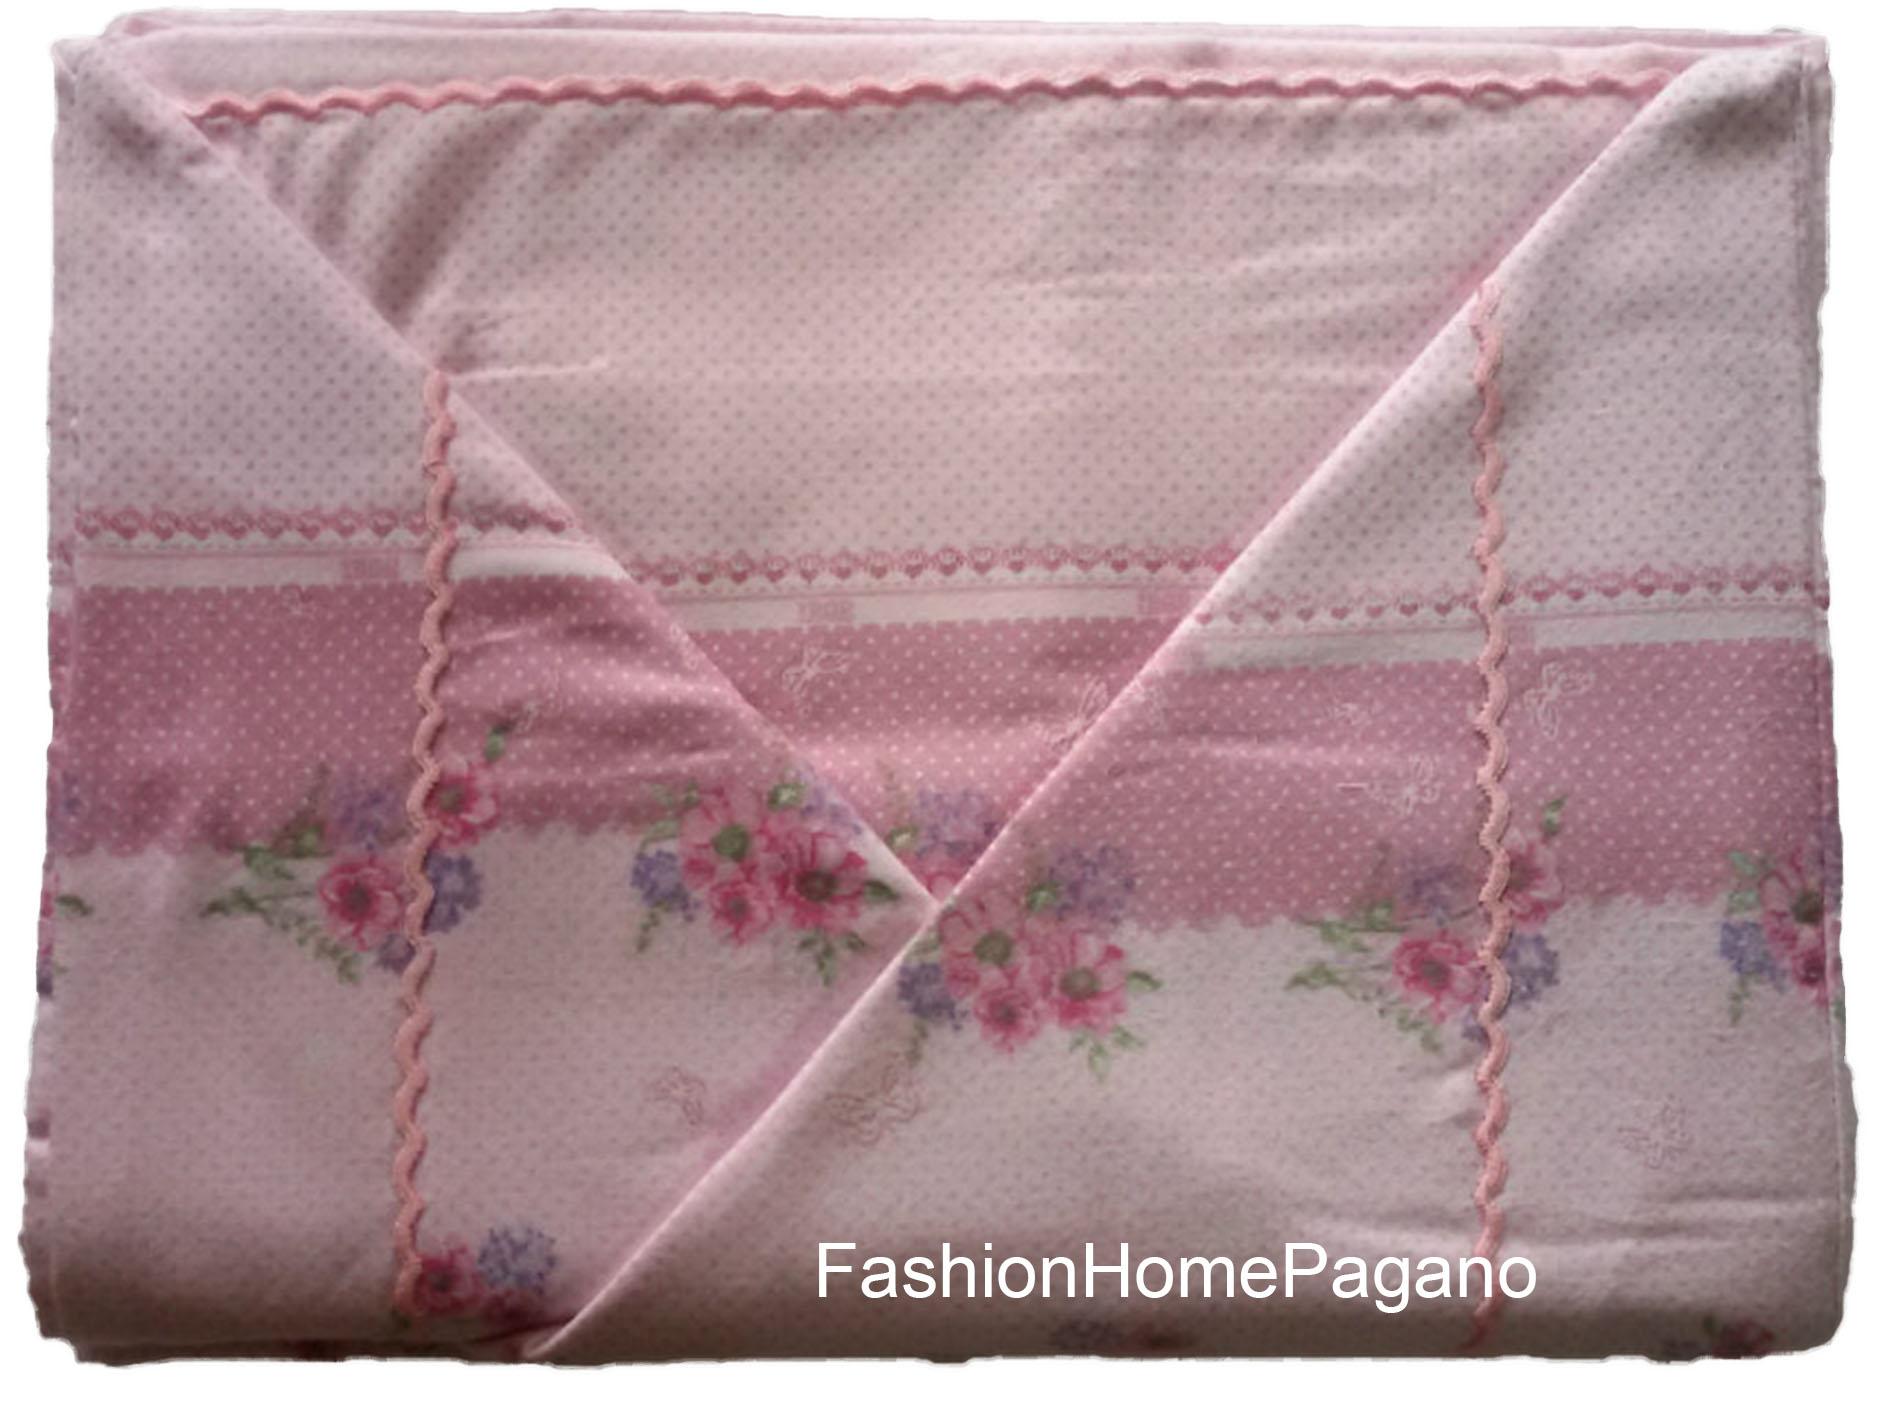 Lenzuola Di Flanella Matrimoniali.Fhp 00283 Lenzuola Flanella Matrimoniali Fashion Home Pagano